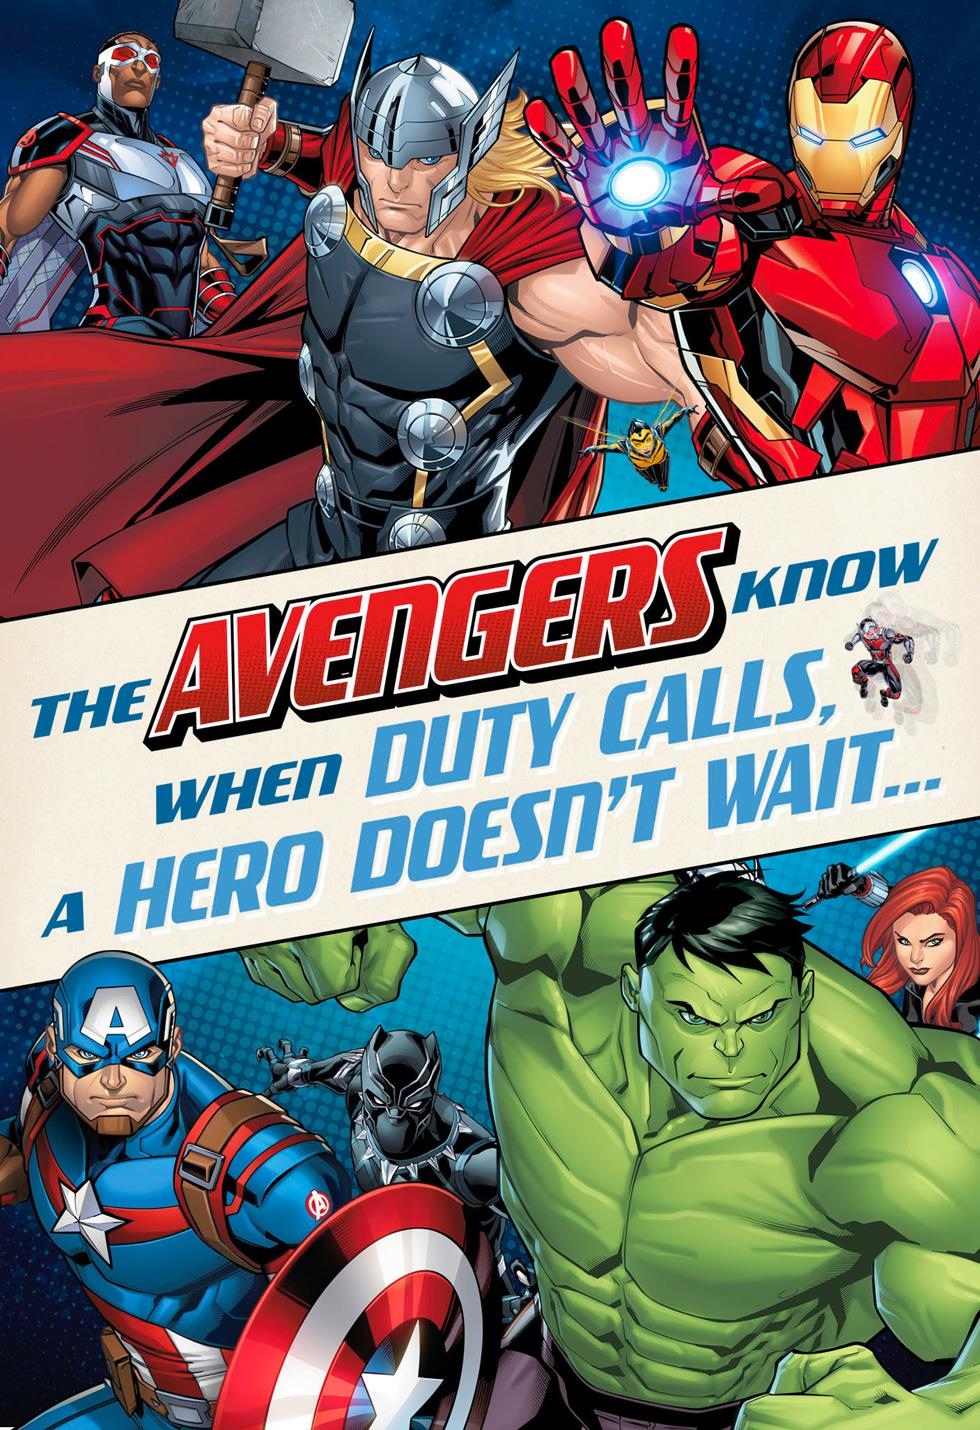 marvel avengers duty calls musical birthday card